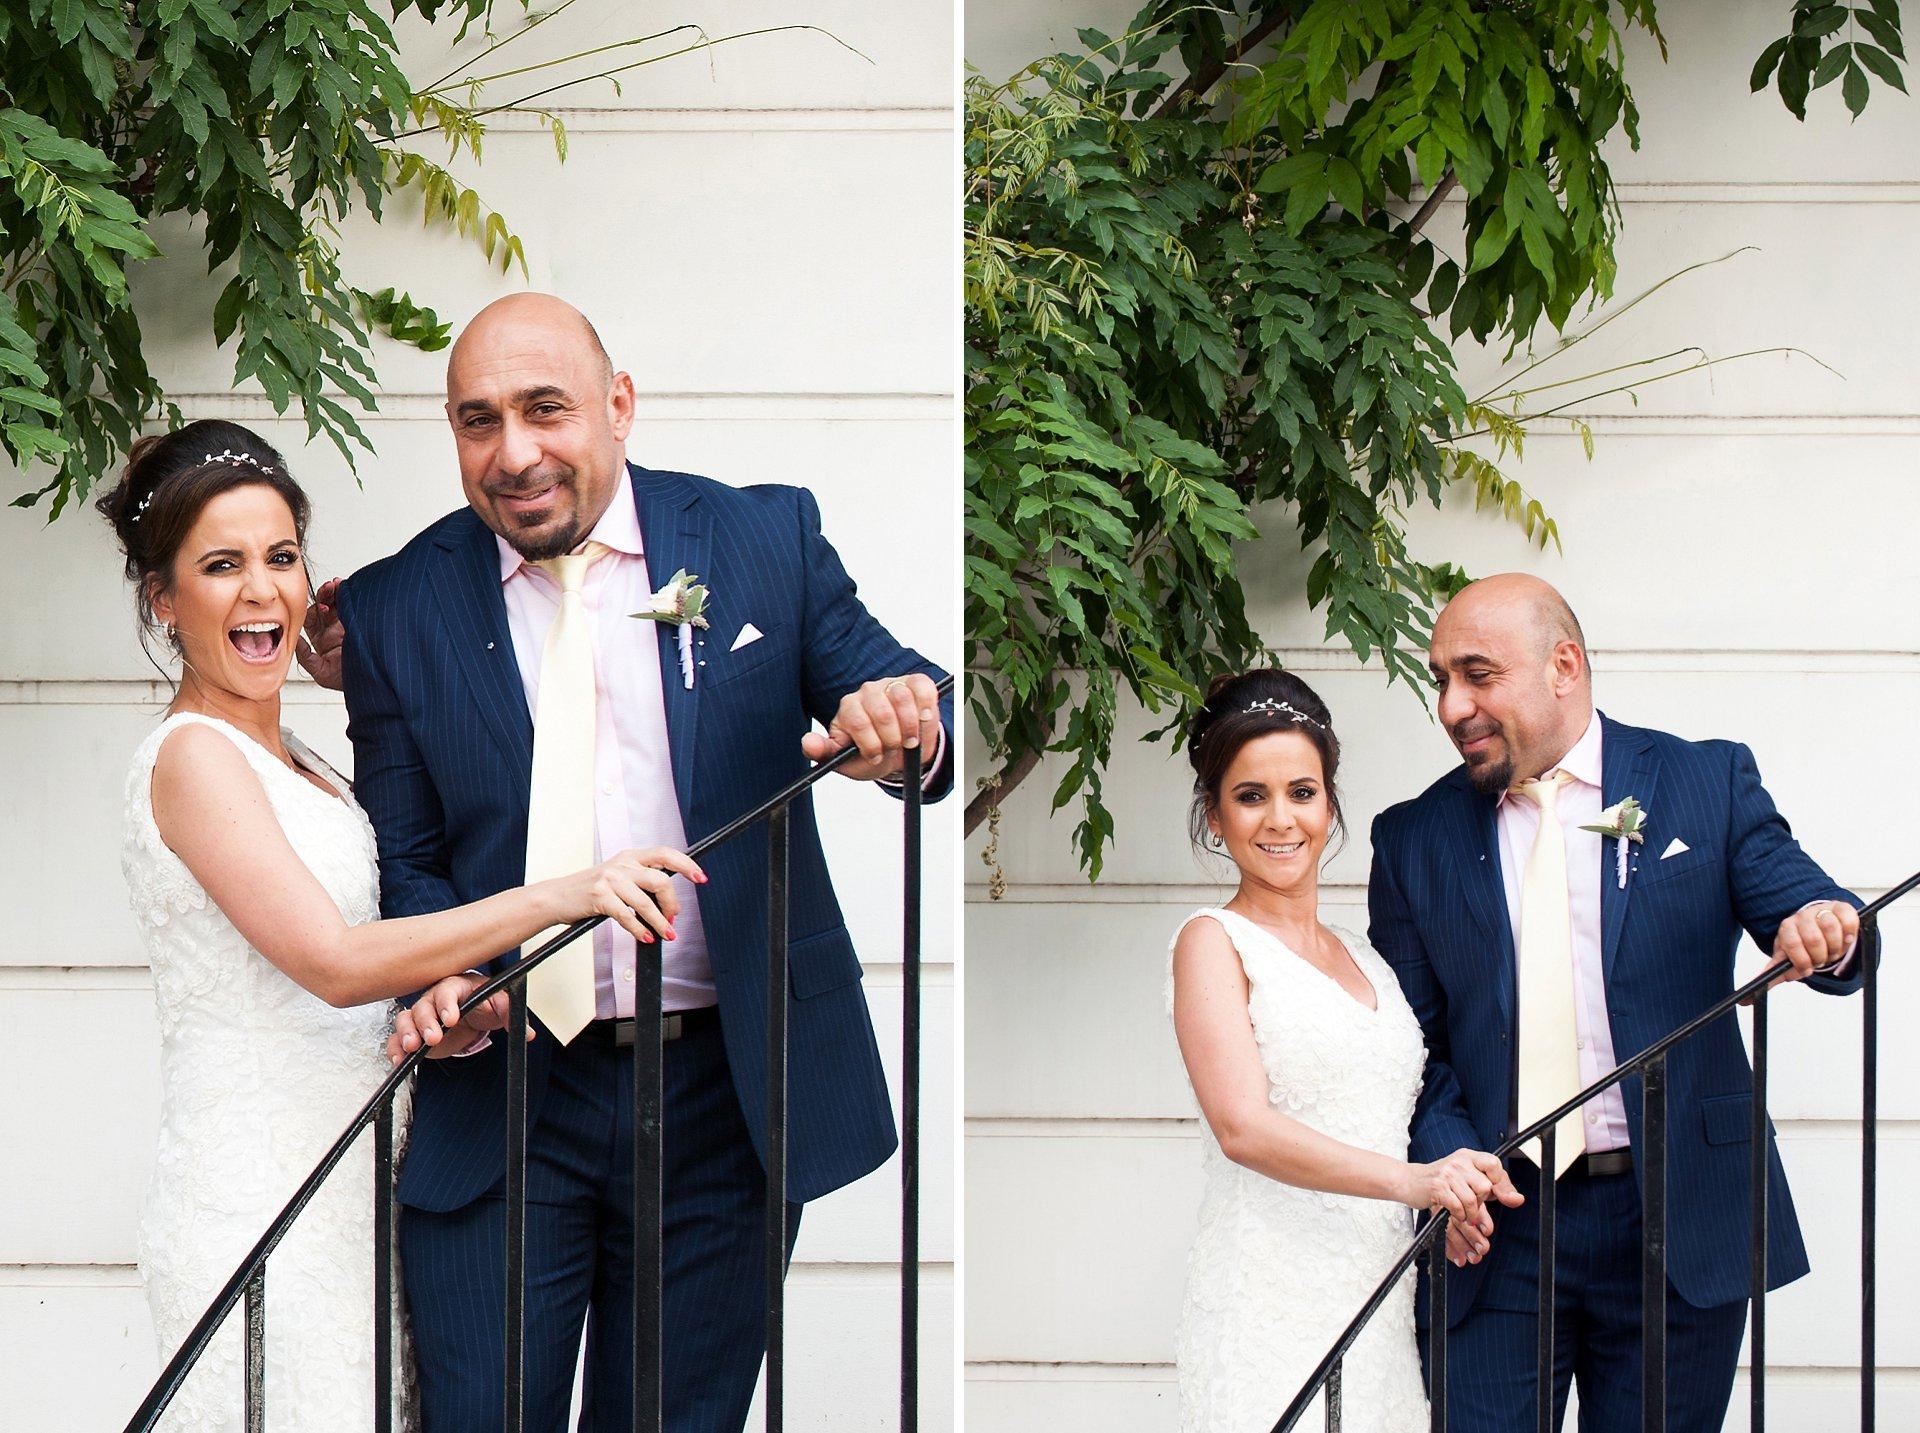 Bride & groom laughing after their Chelsea wedding